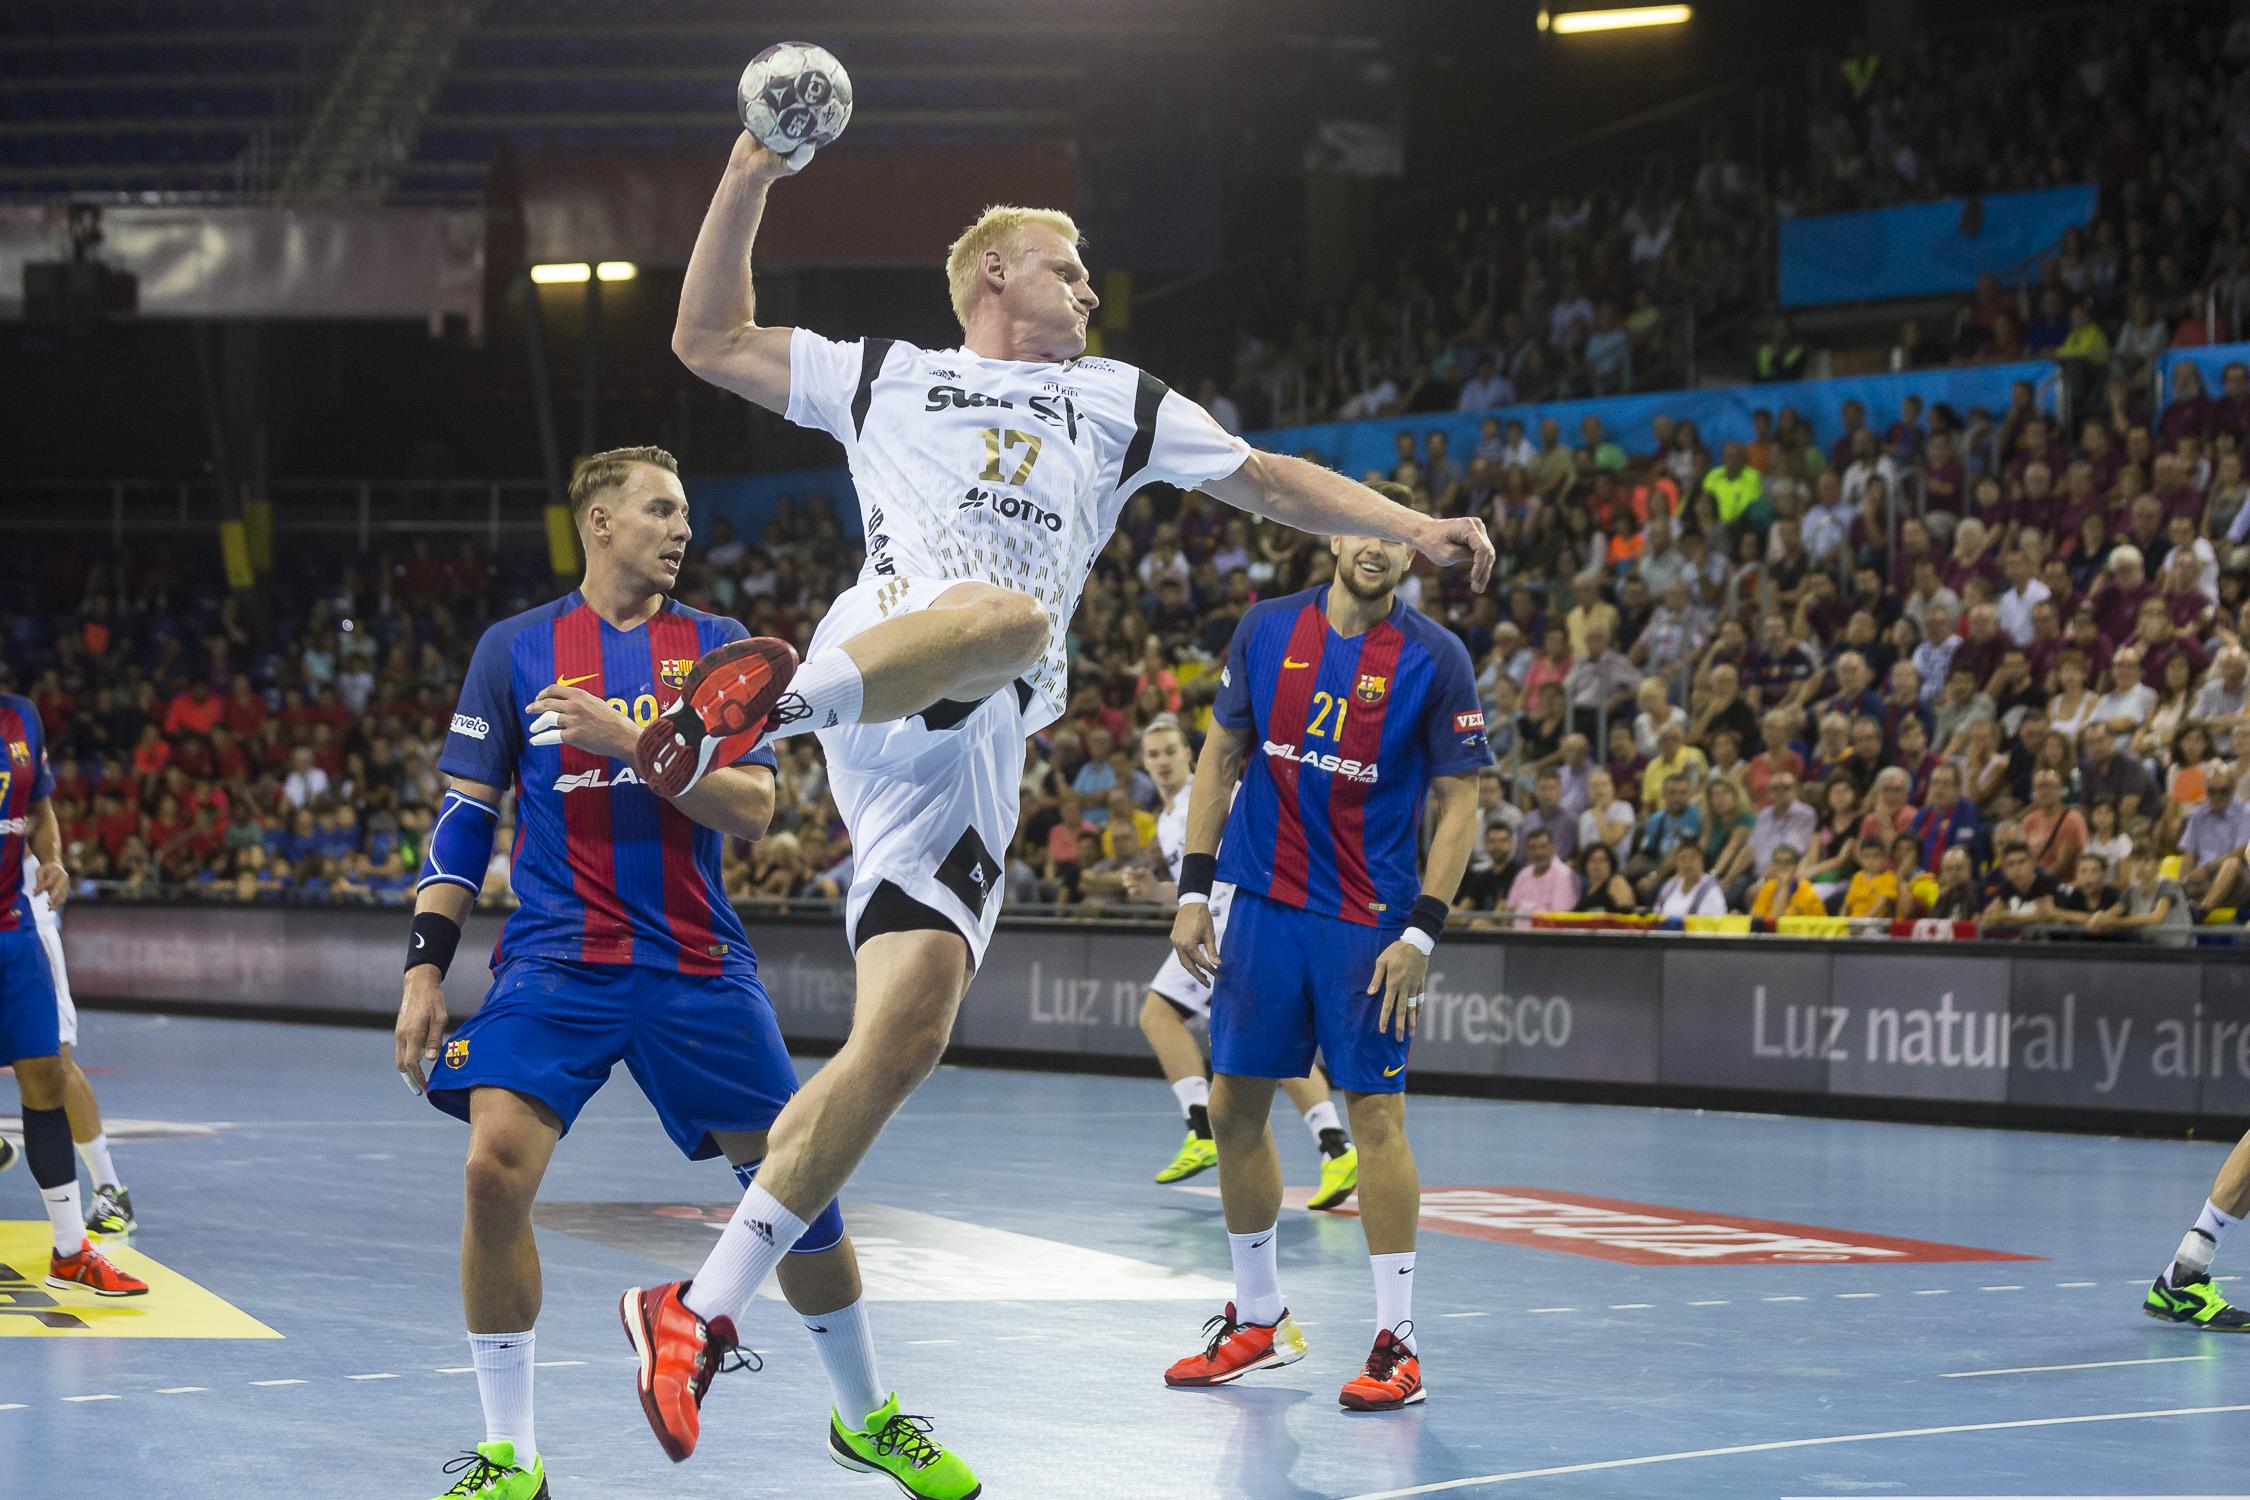 portfolio20161001-handball-cl-barca-thw-kiel-407-bc3t0009